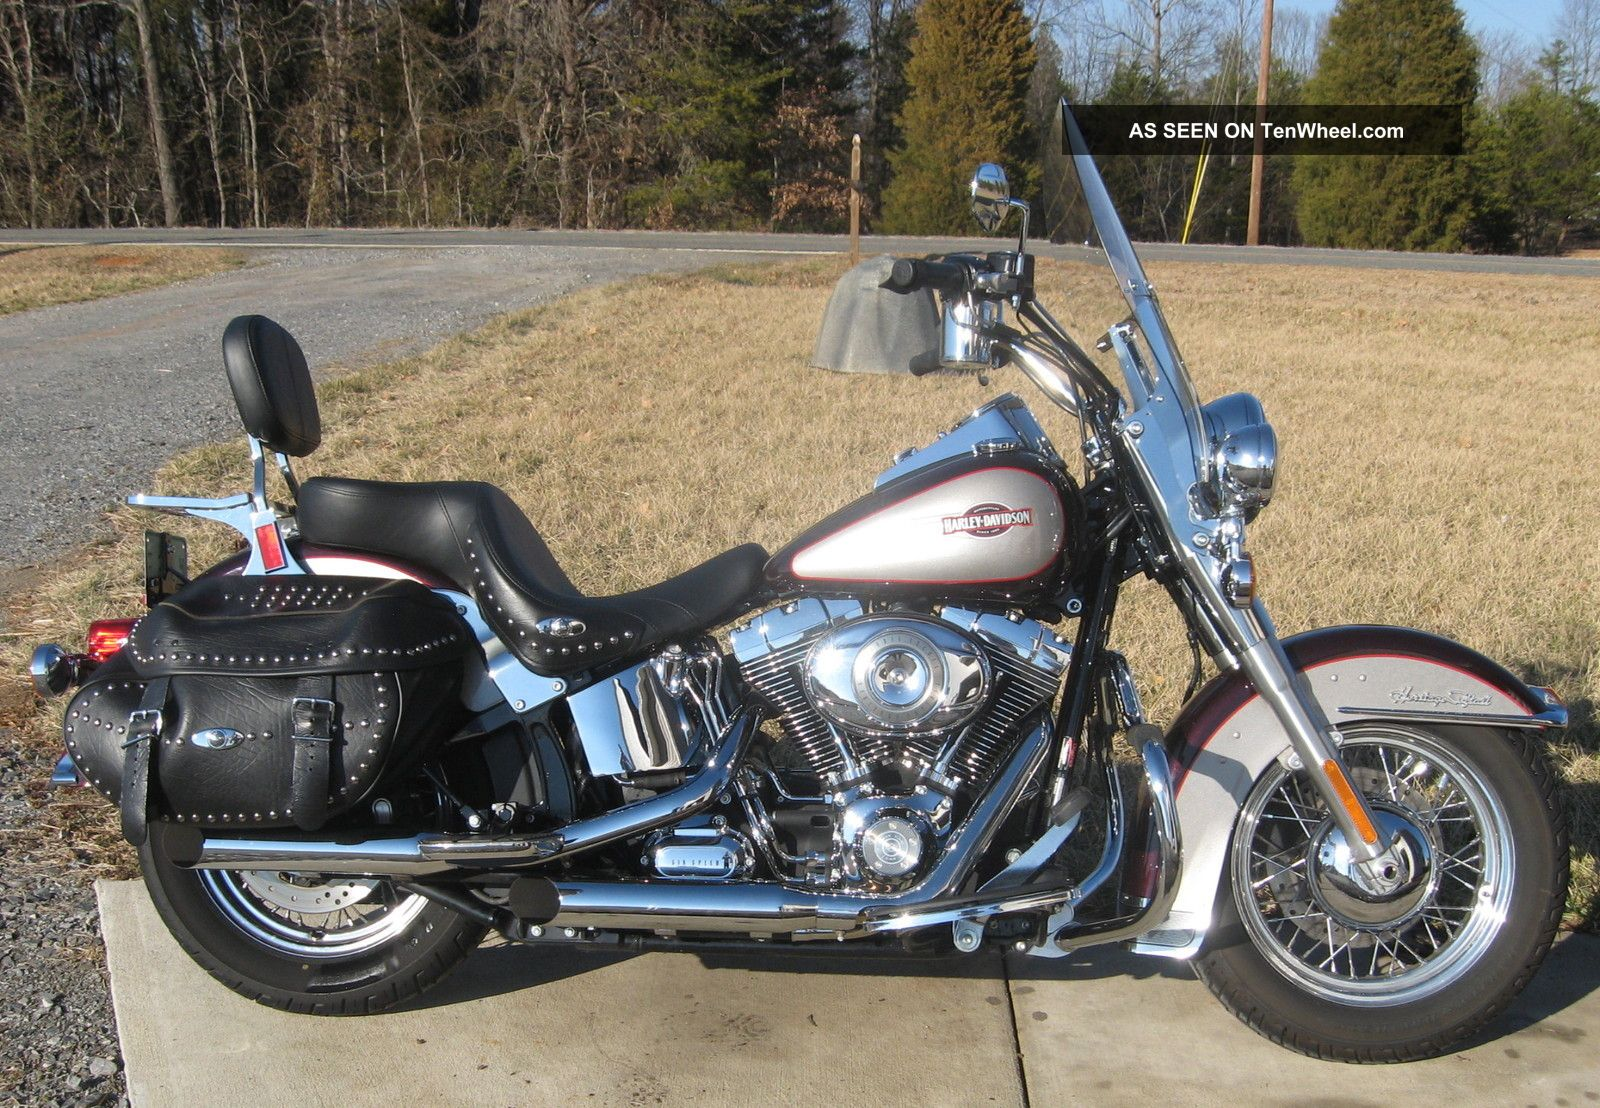 2007 Harley Davidson Motorcycle Heritage Softail Classic